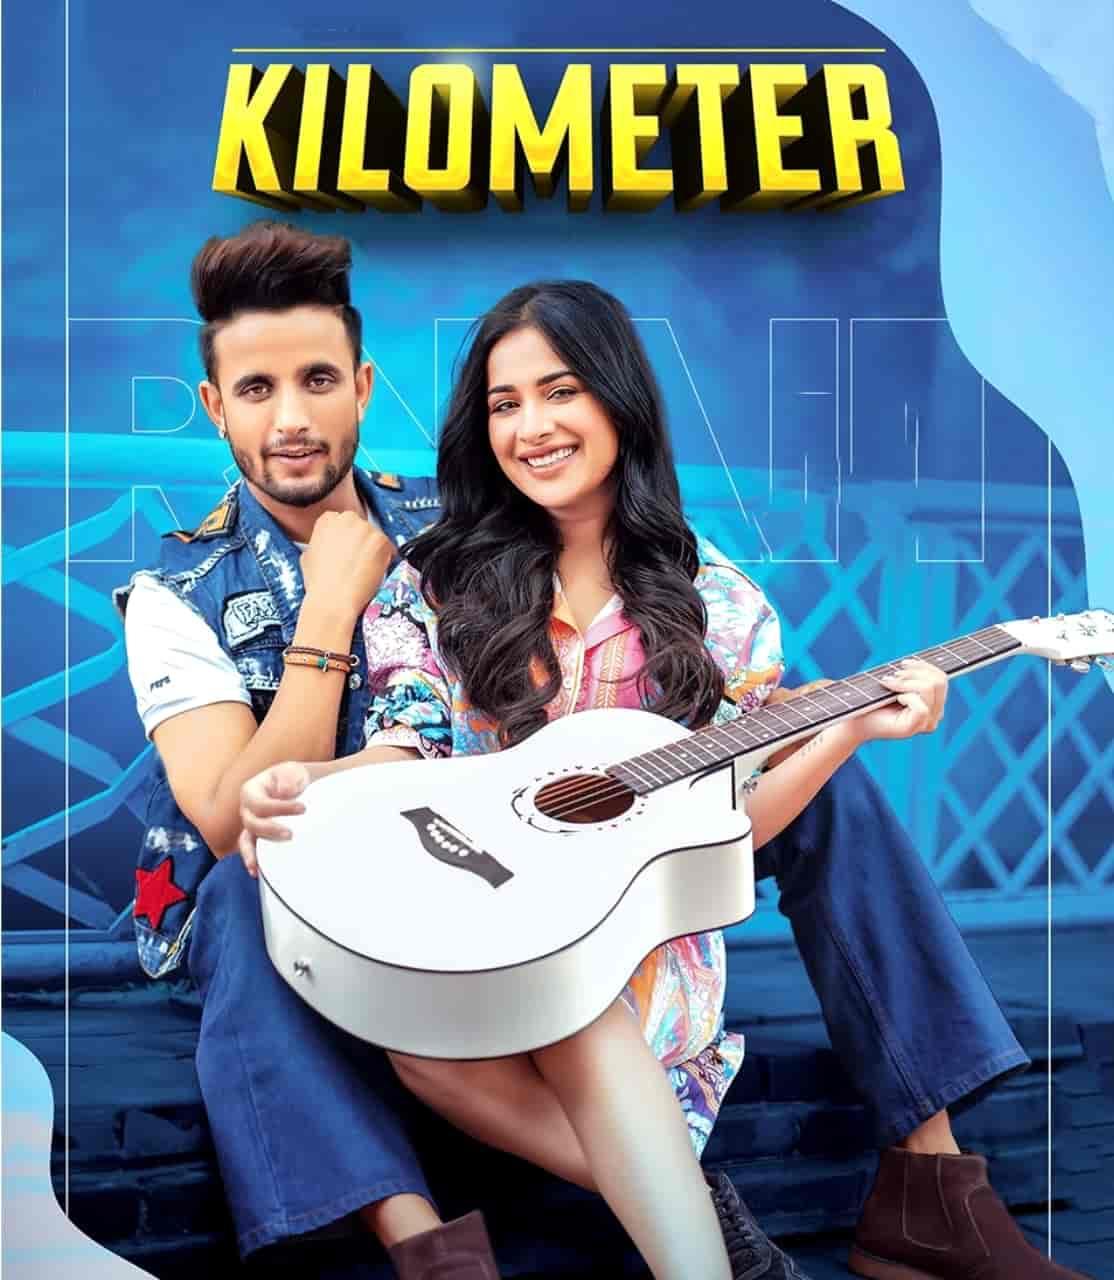 Kilometer Punjabi Song Image By R Nait